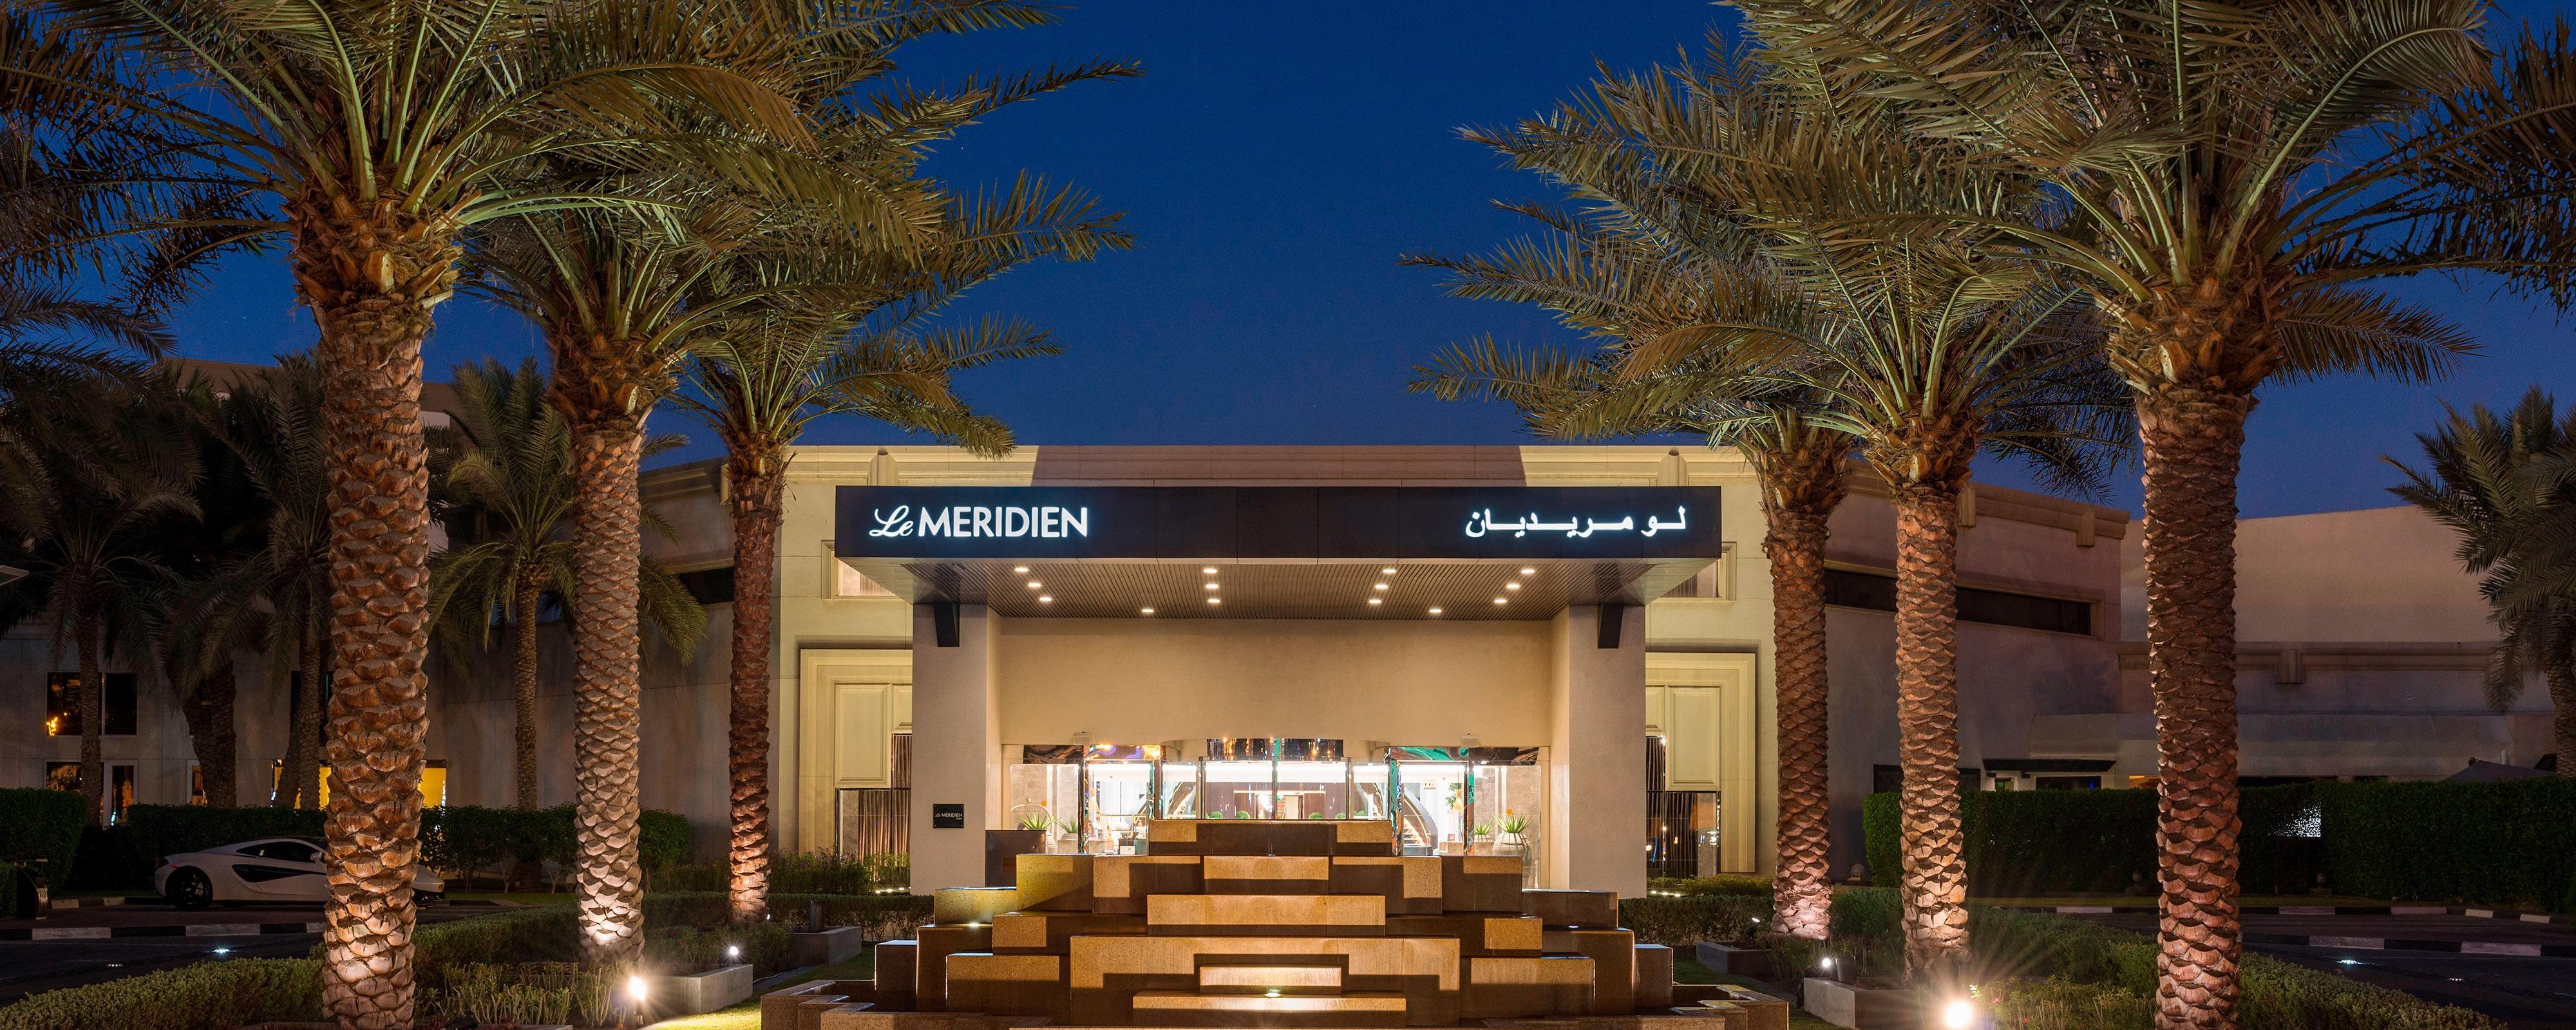 5 Star Dubai Airport Hotel Le Meridien Dubai Hotel